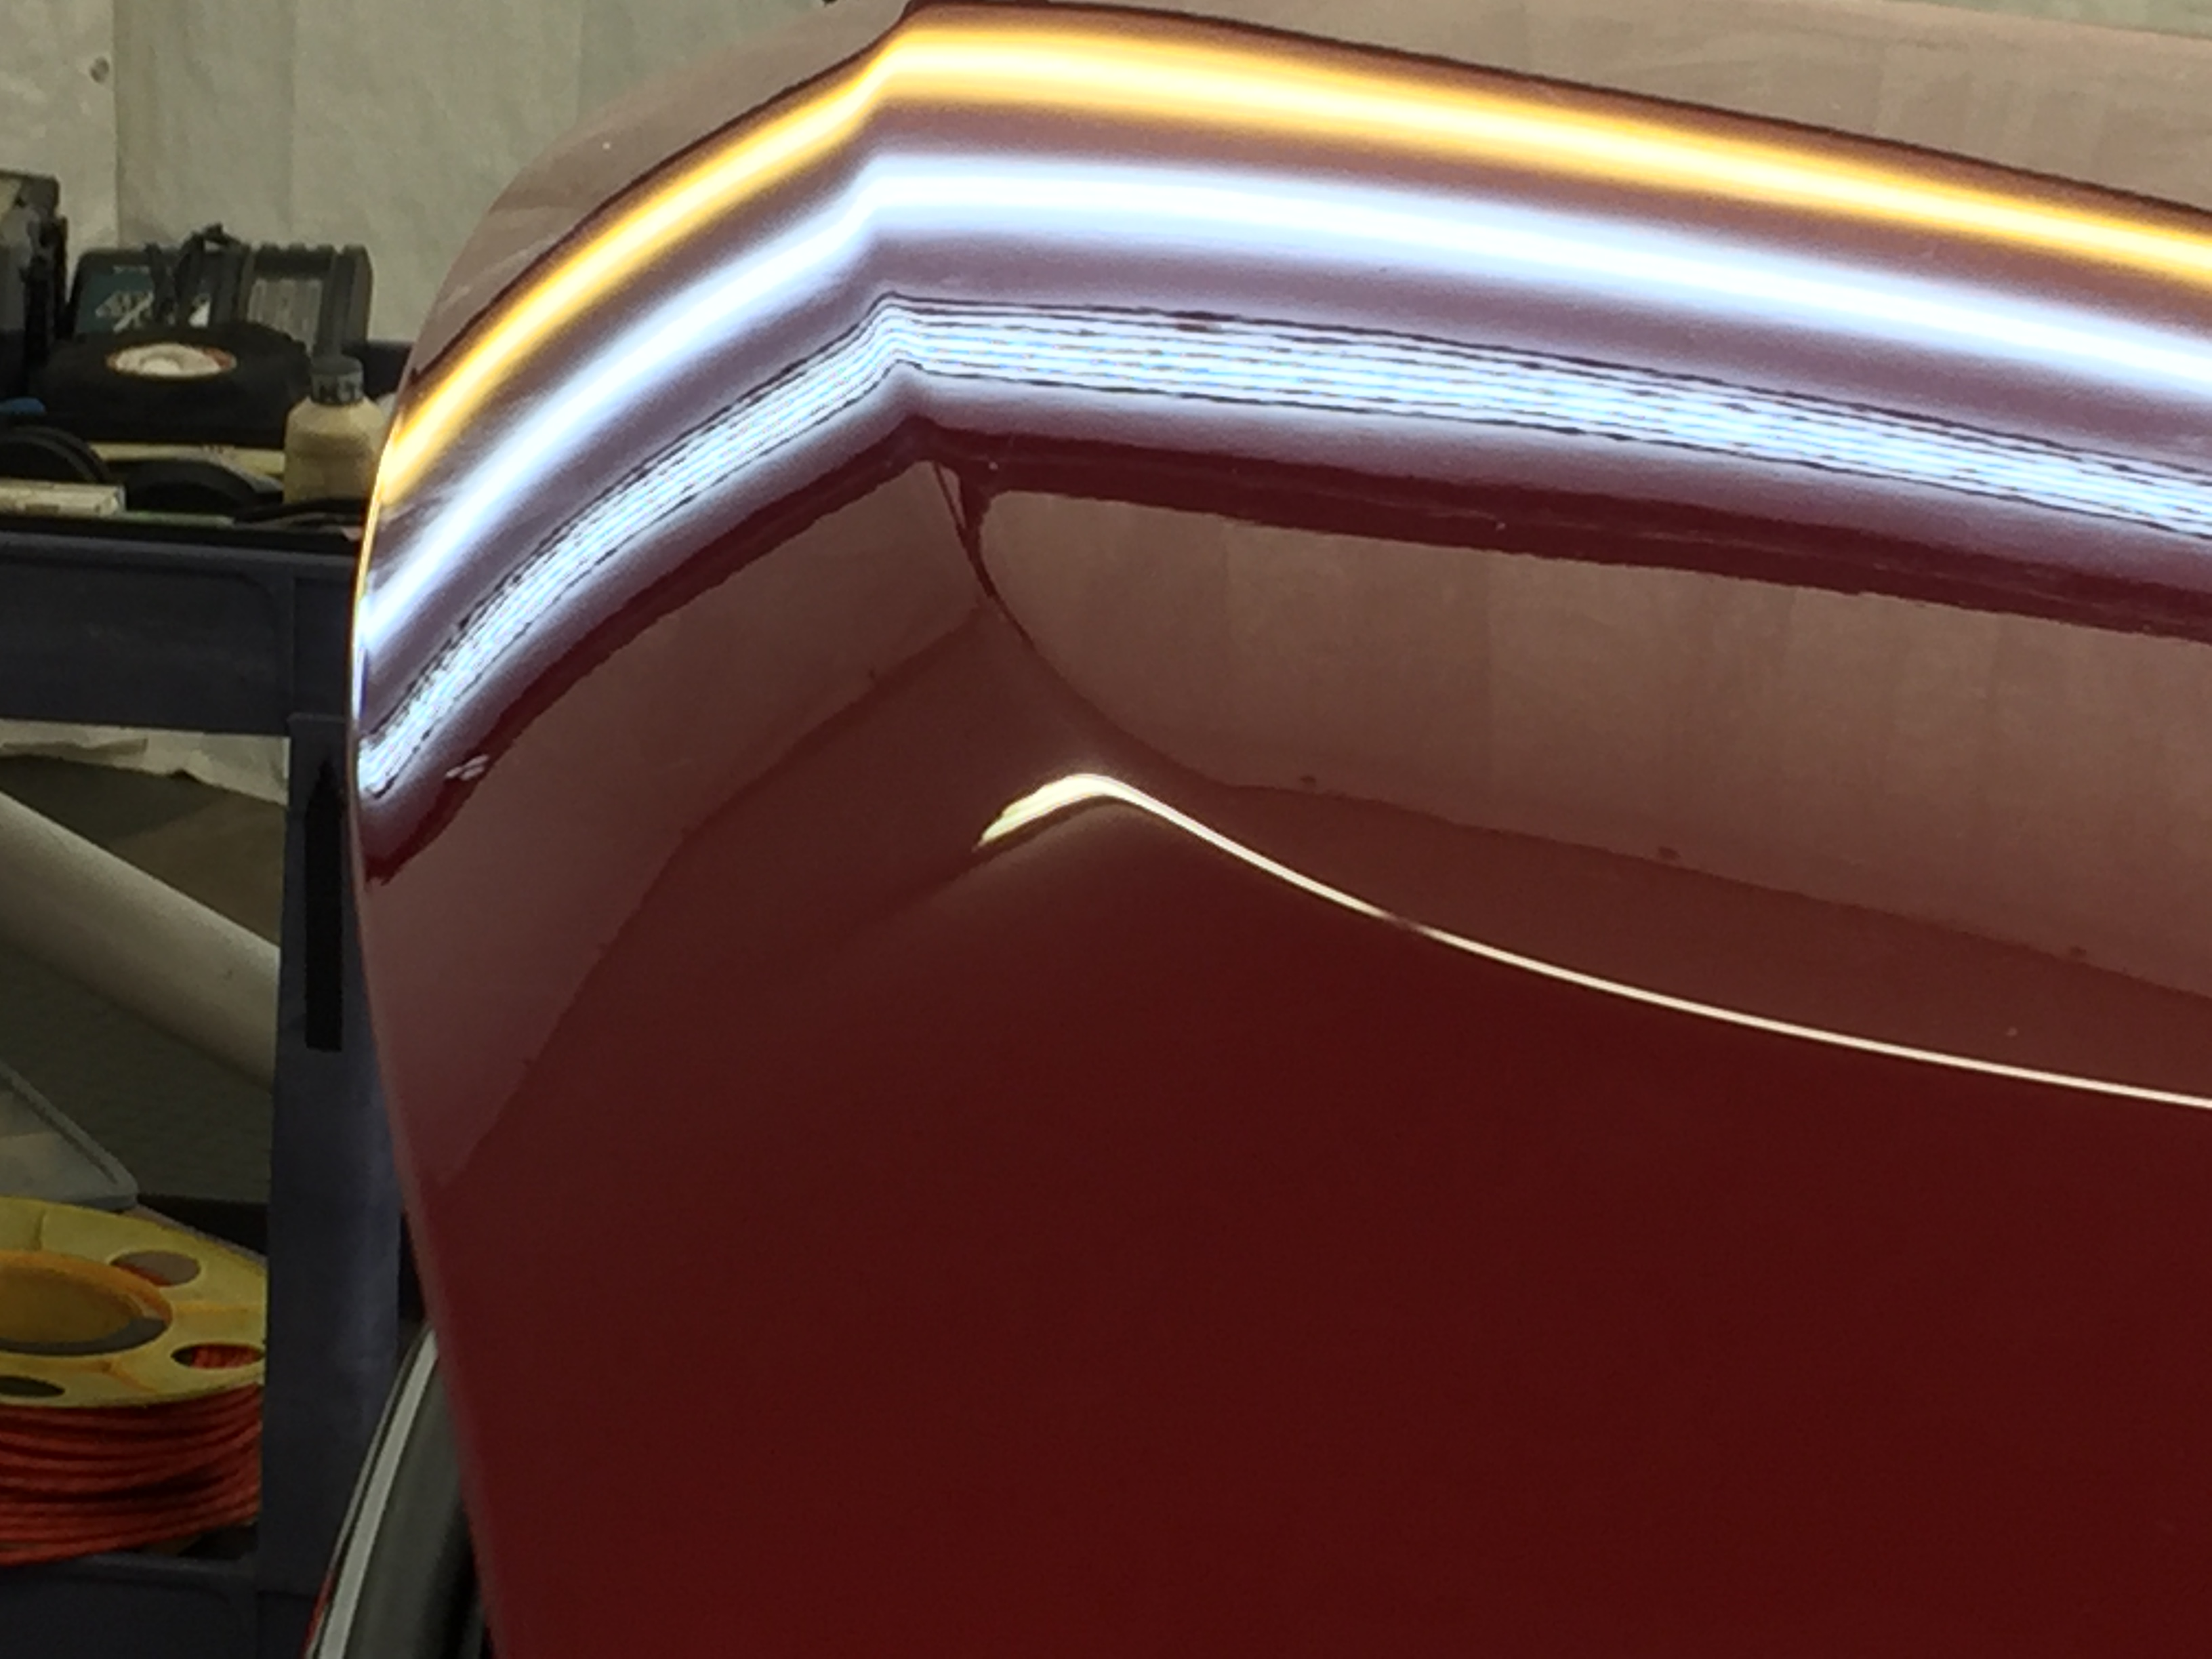 2016 Yukon Dent Removal on hood Springfield, IL, http://217dent.com